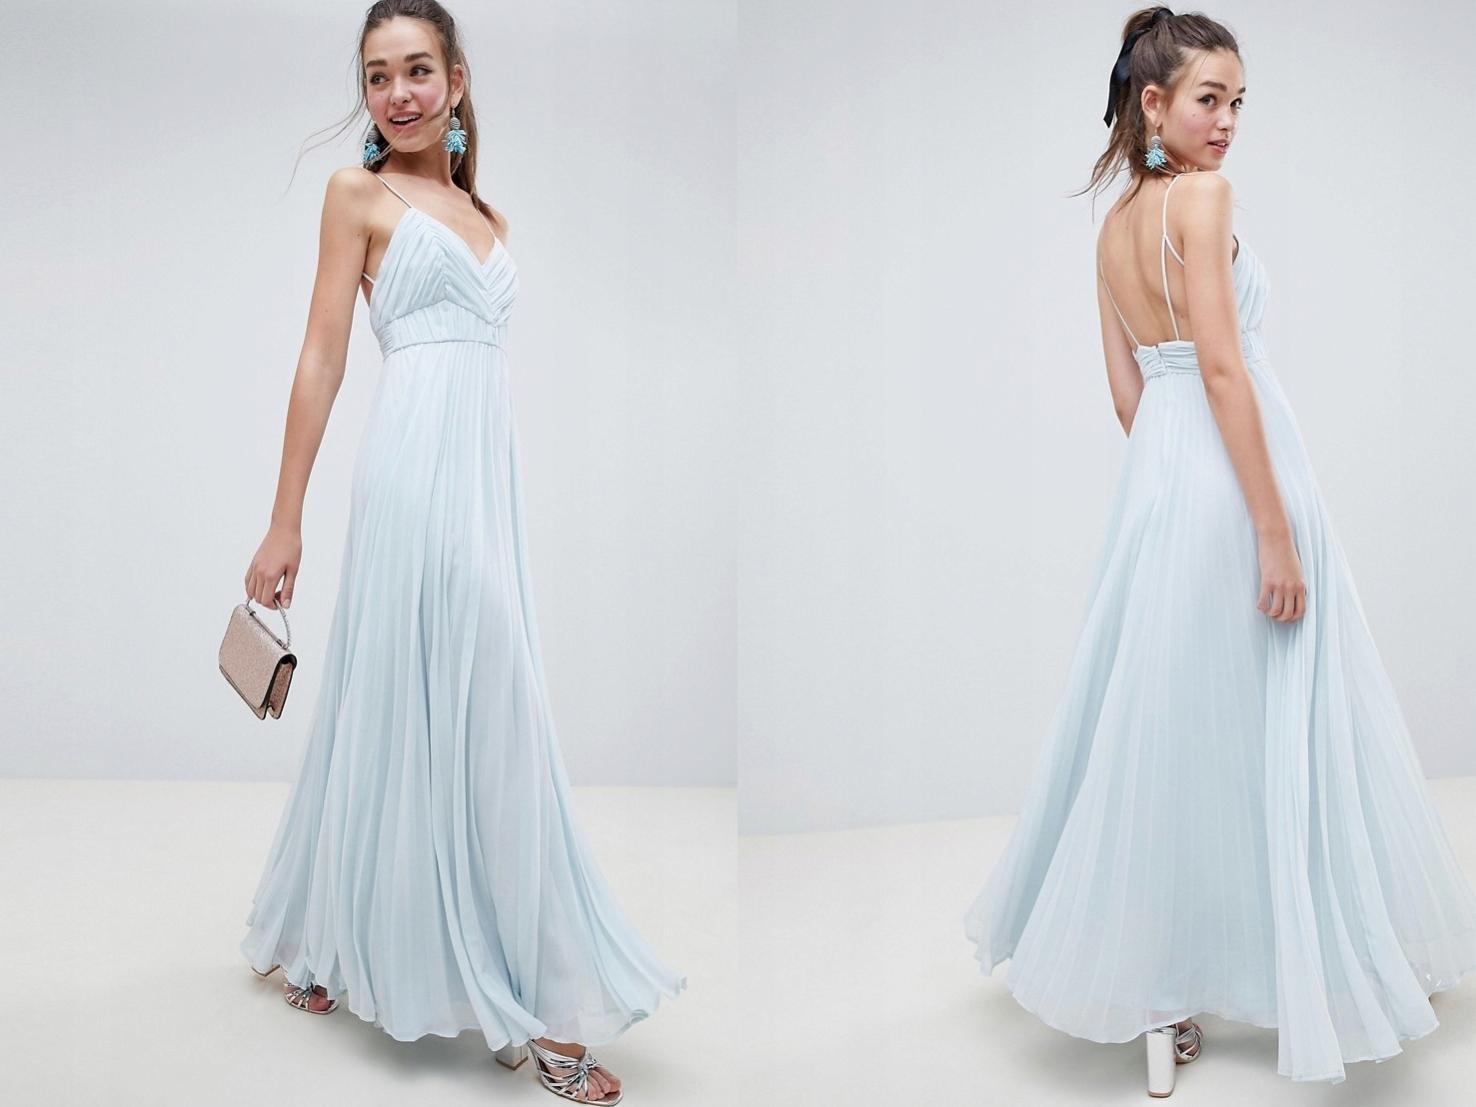 Sukienka Maxi Plisowana na ramiączkach M/38